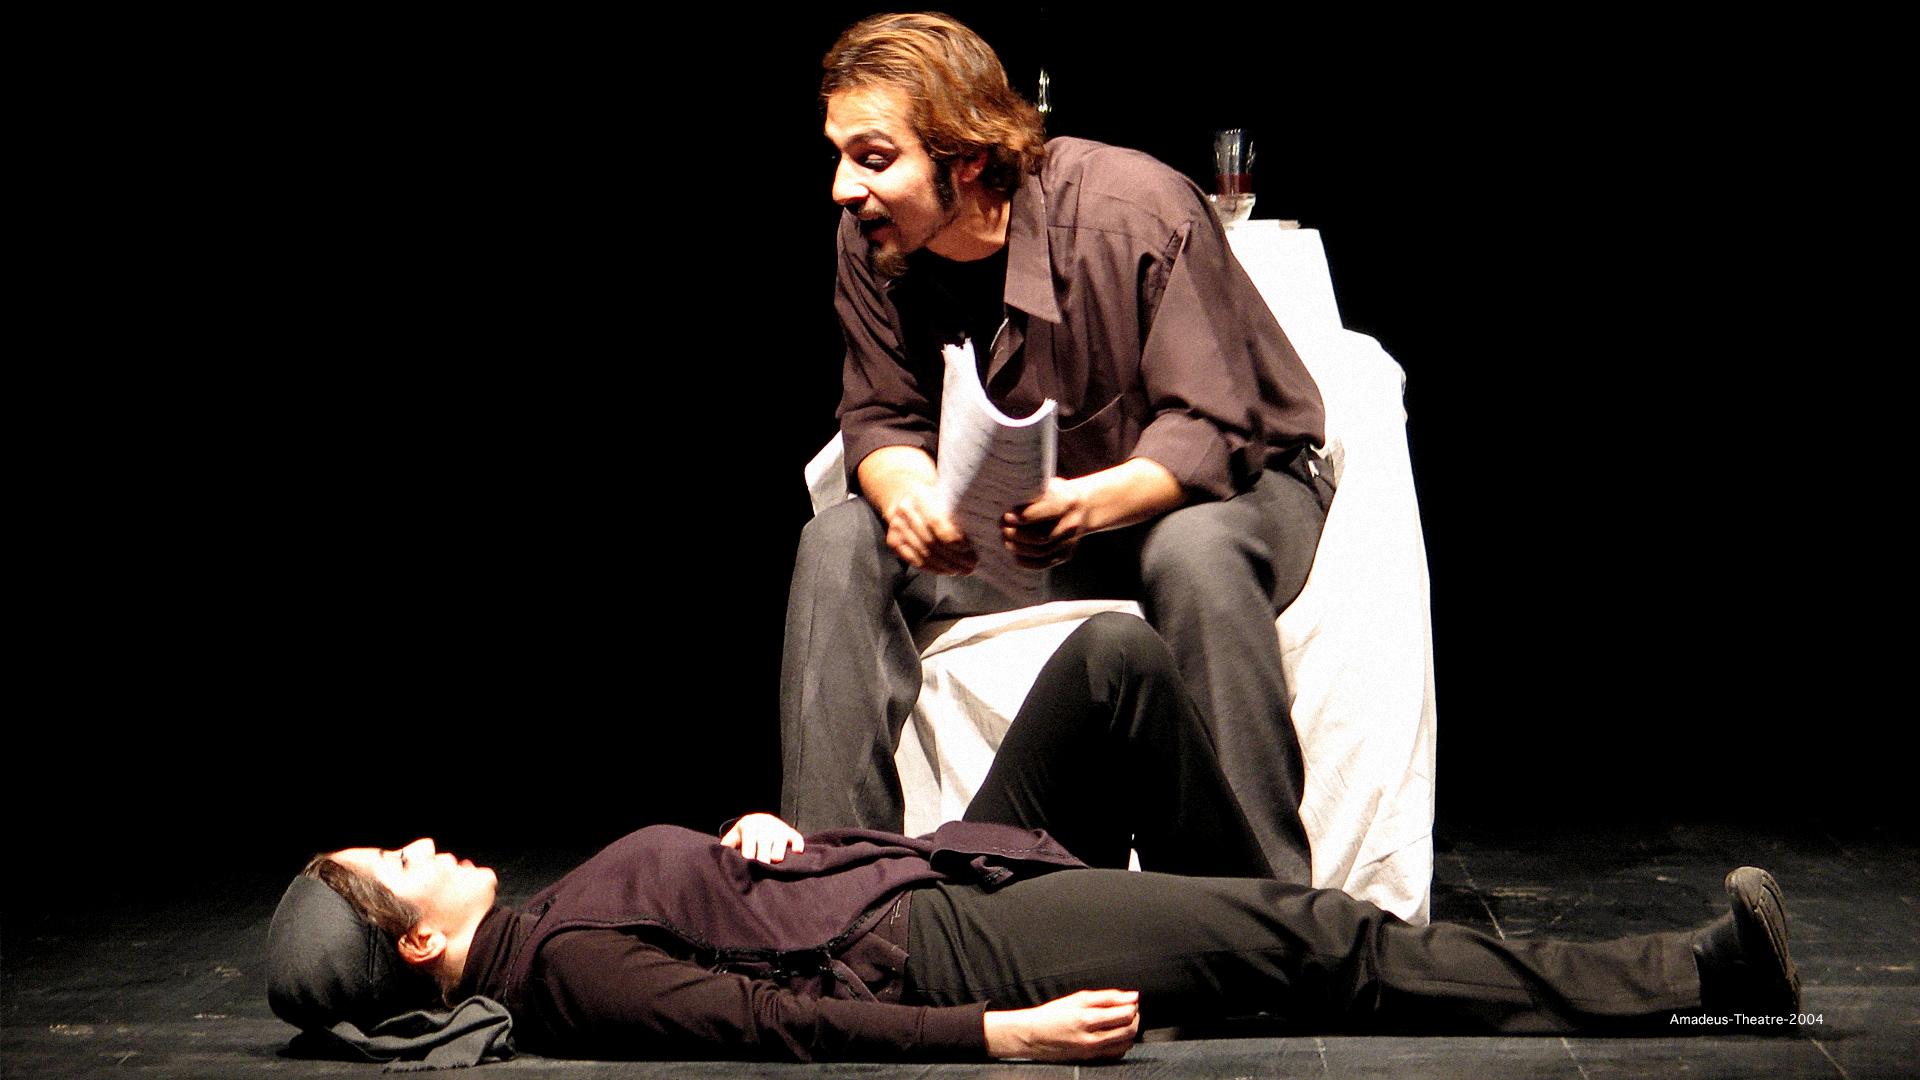 http://farhadbazyan.com/wp-content/uploads/2021/01/Amadeus-Theatre-2004-1.jpg